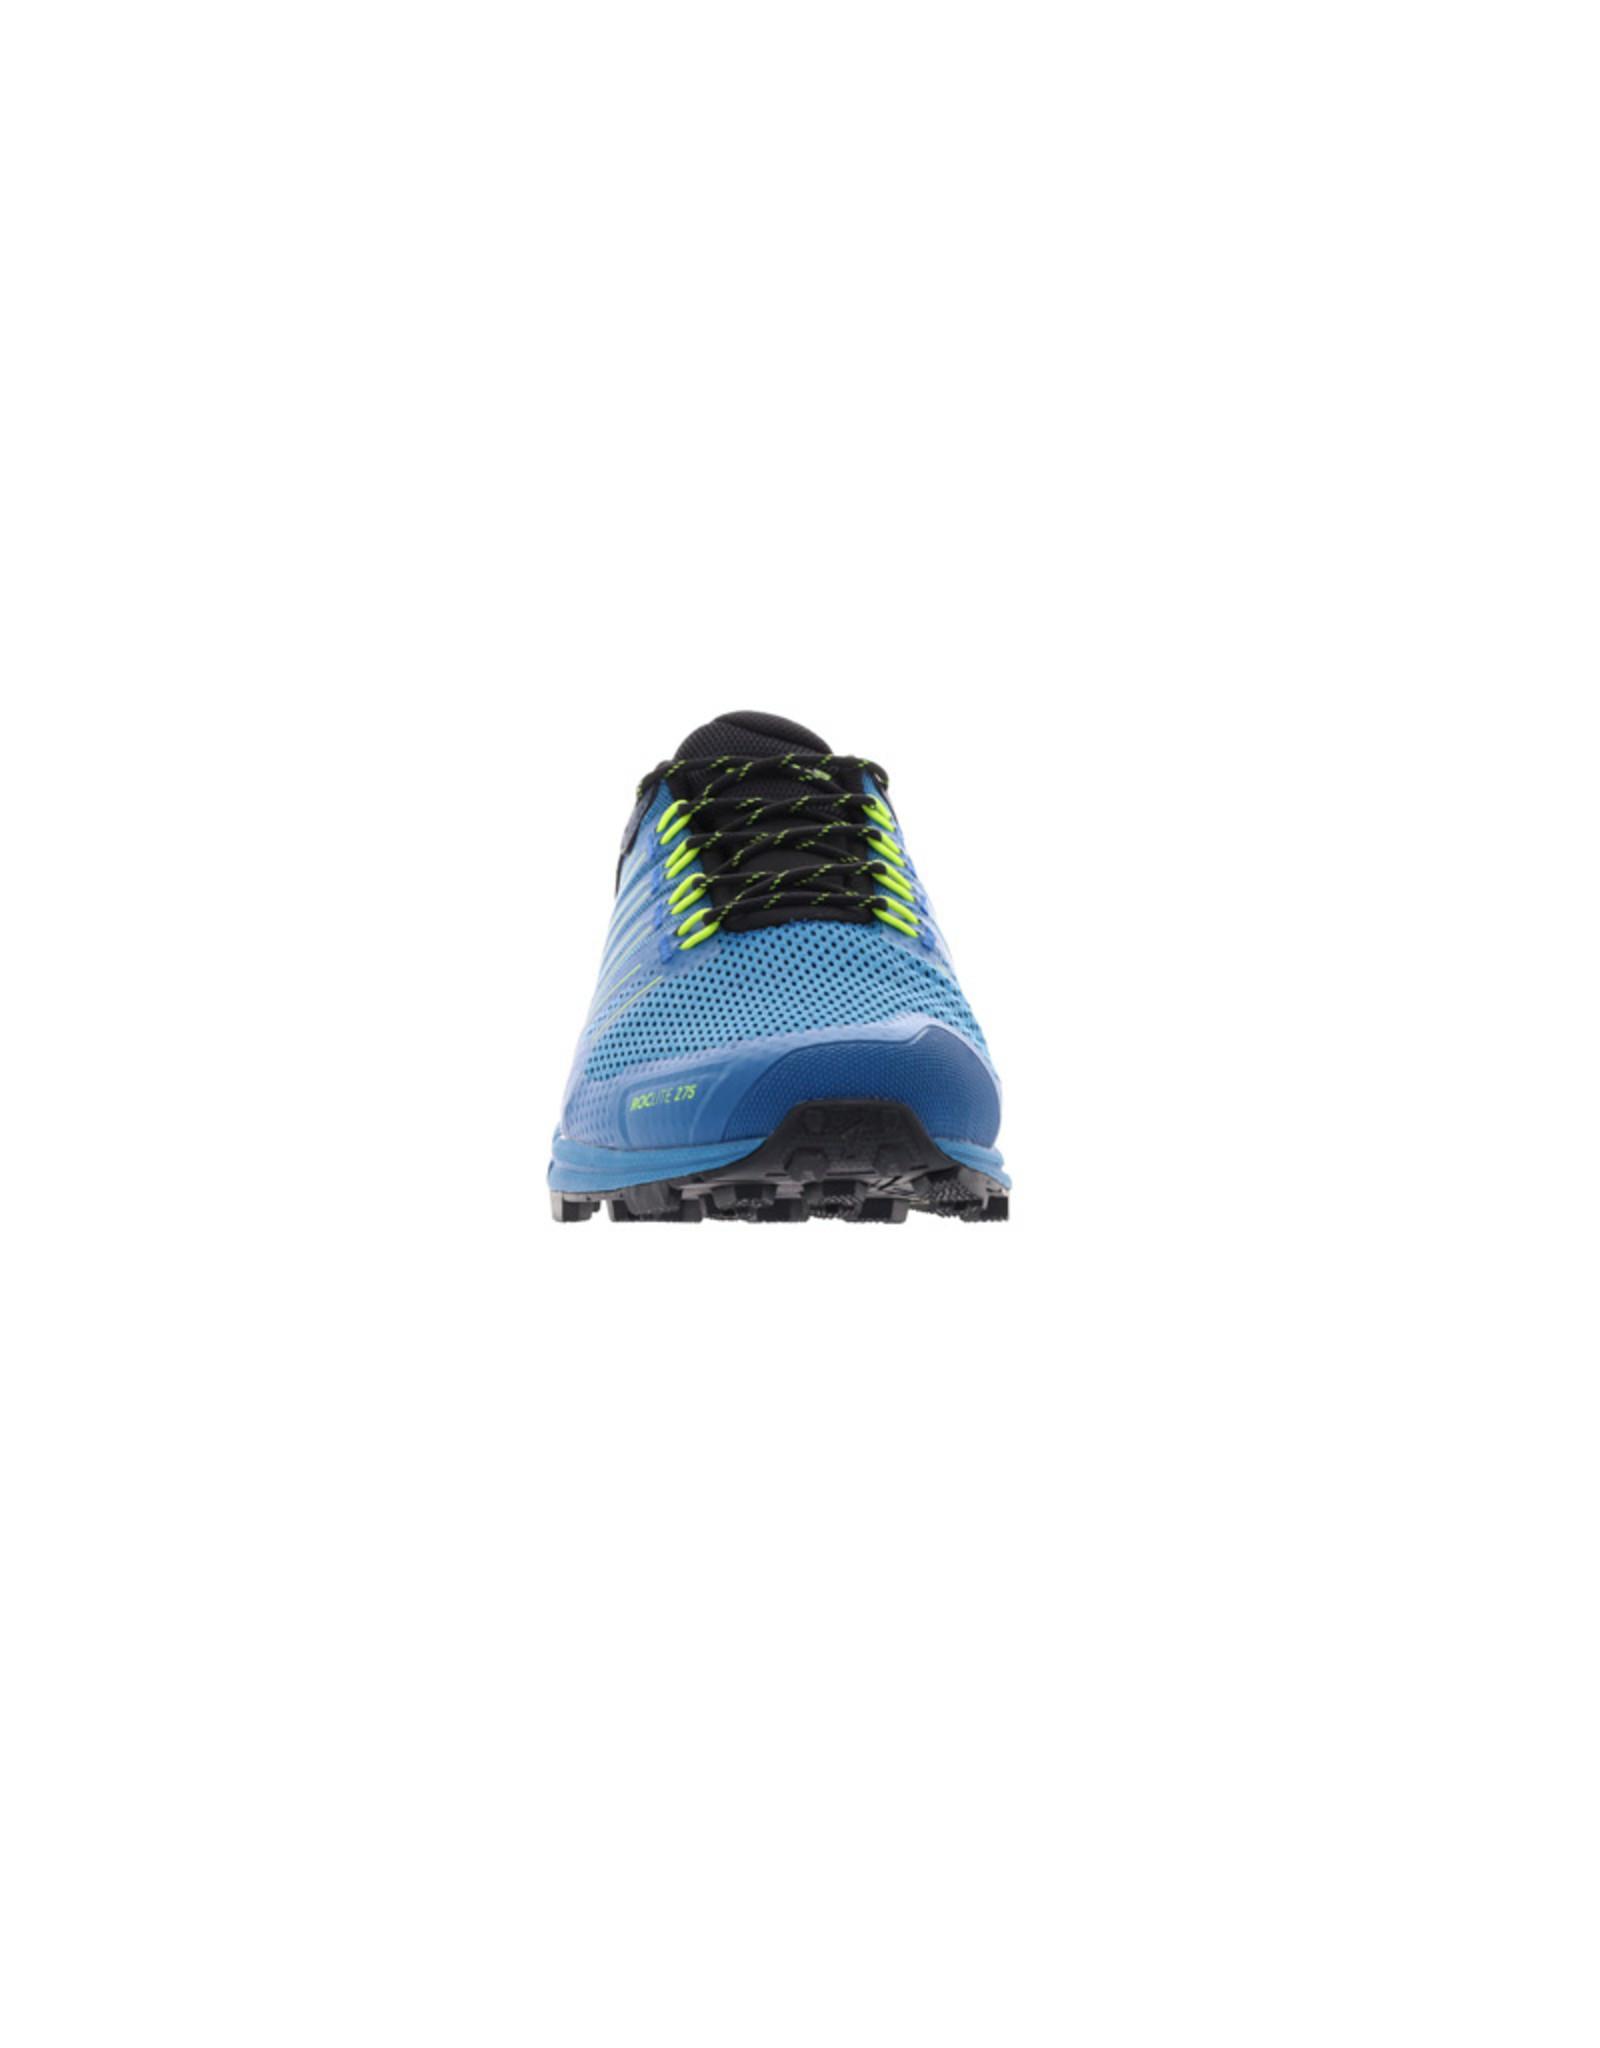 Inov-8 Roclite 275 Chaussure Trailrun - Bleu/Jaune